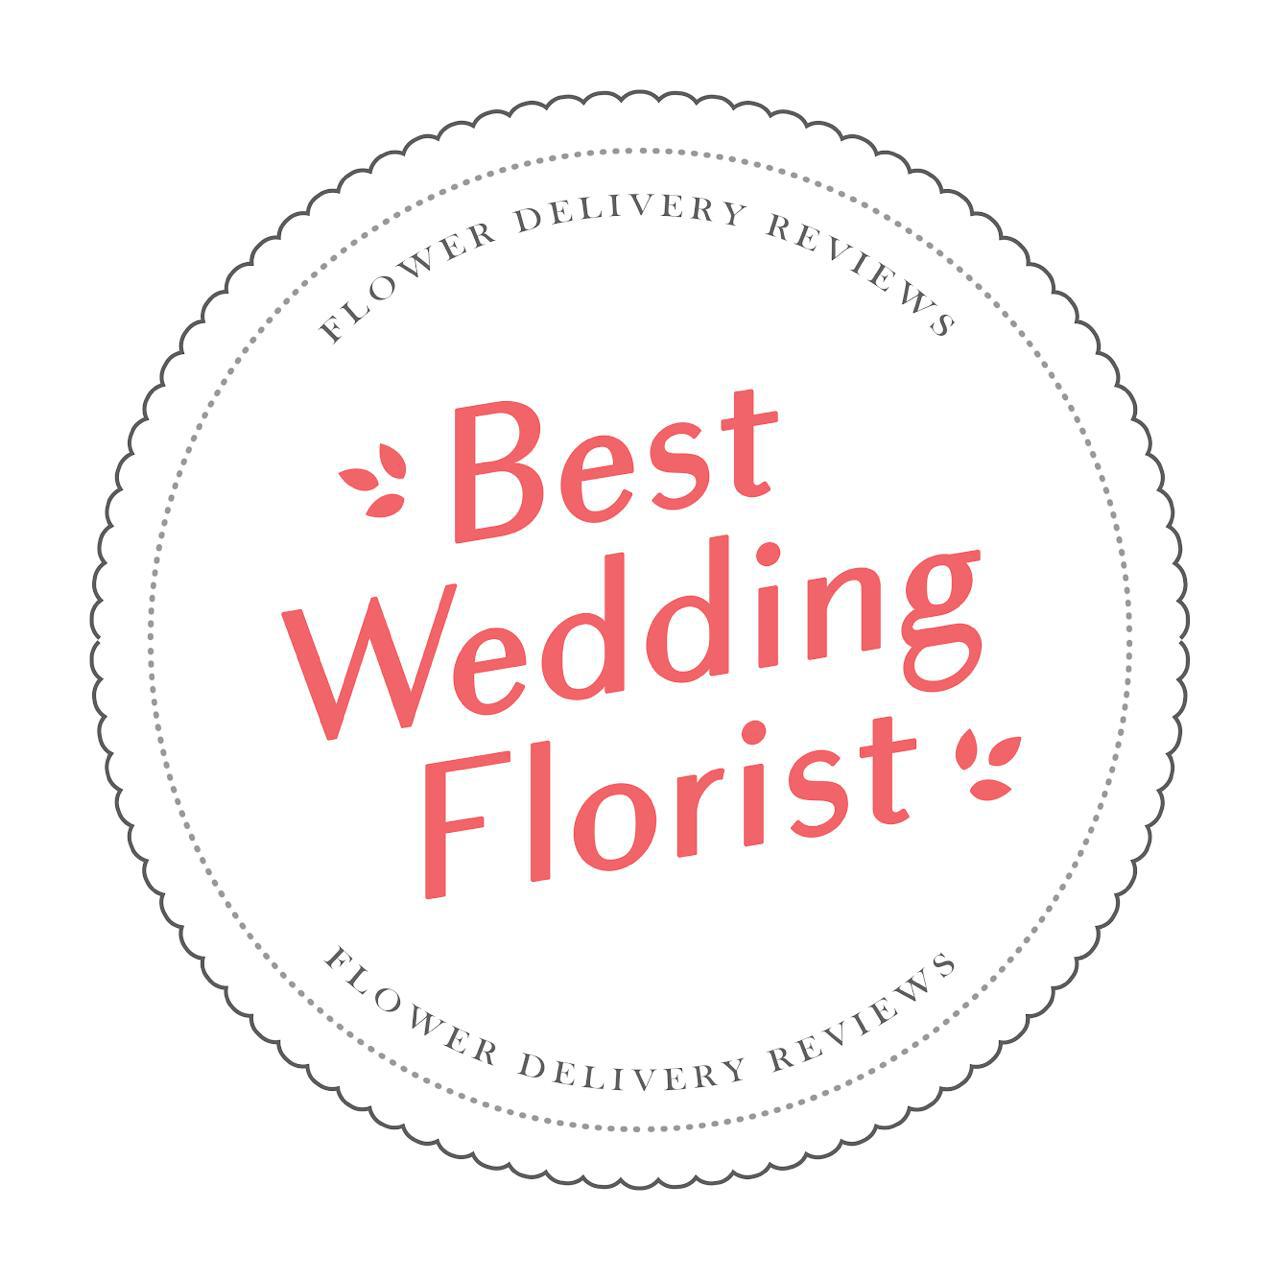 BLUUMBLVD_bestweddingflorist